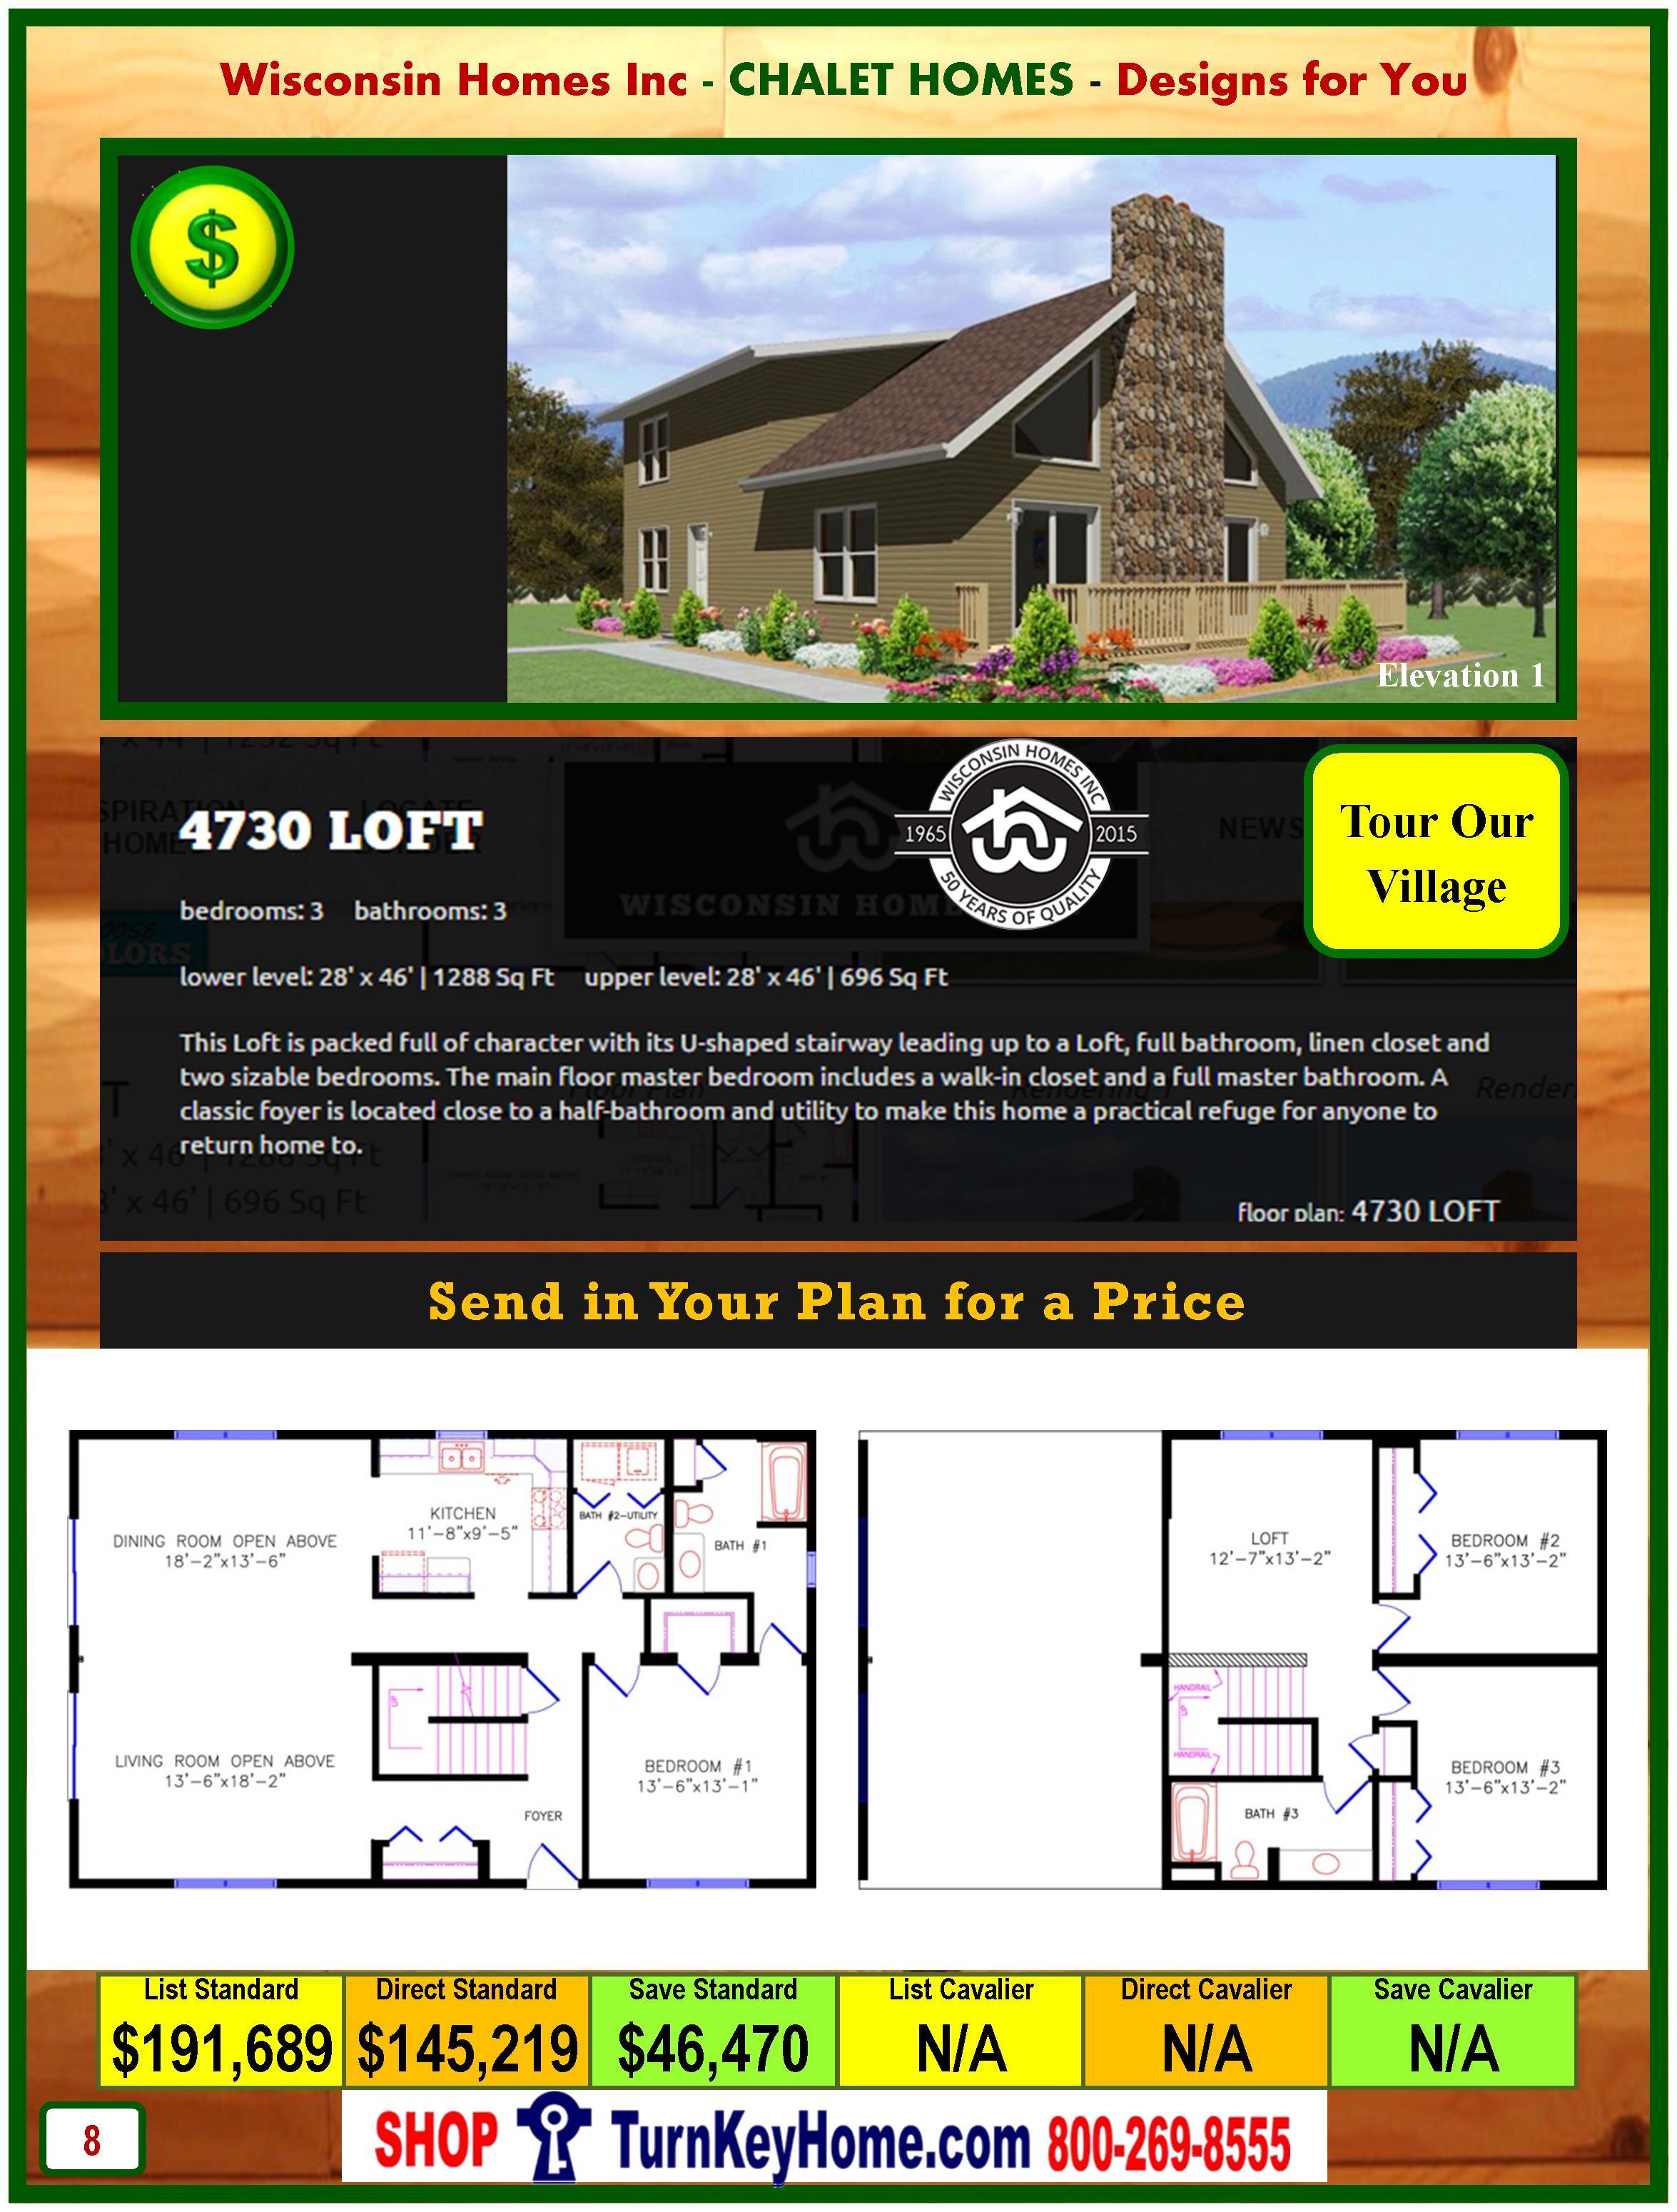 Modular.Home.Catalog.Wisconsin.Homes.Inc.Chalet.Loft.4730.P8.1.1215